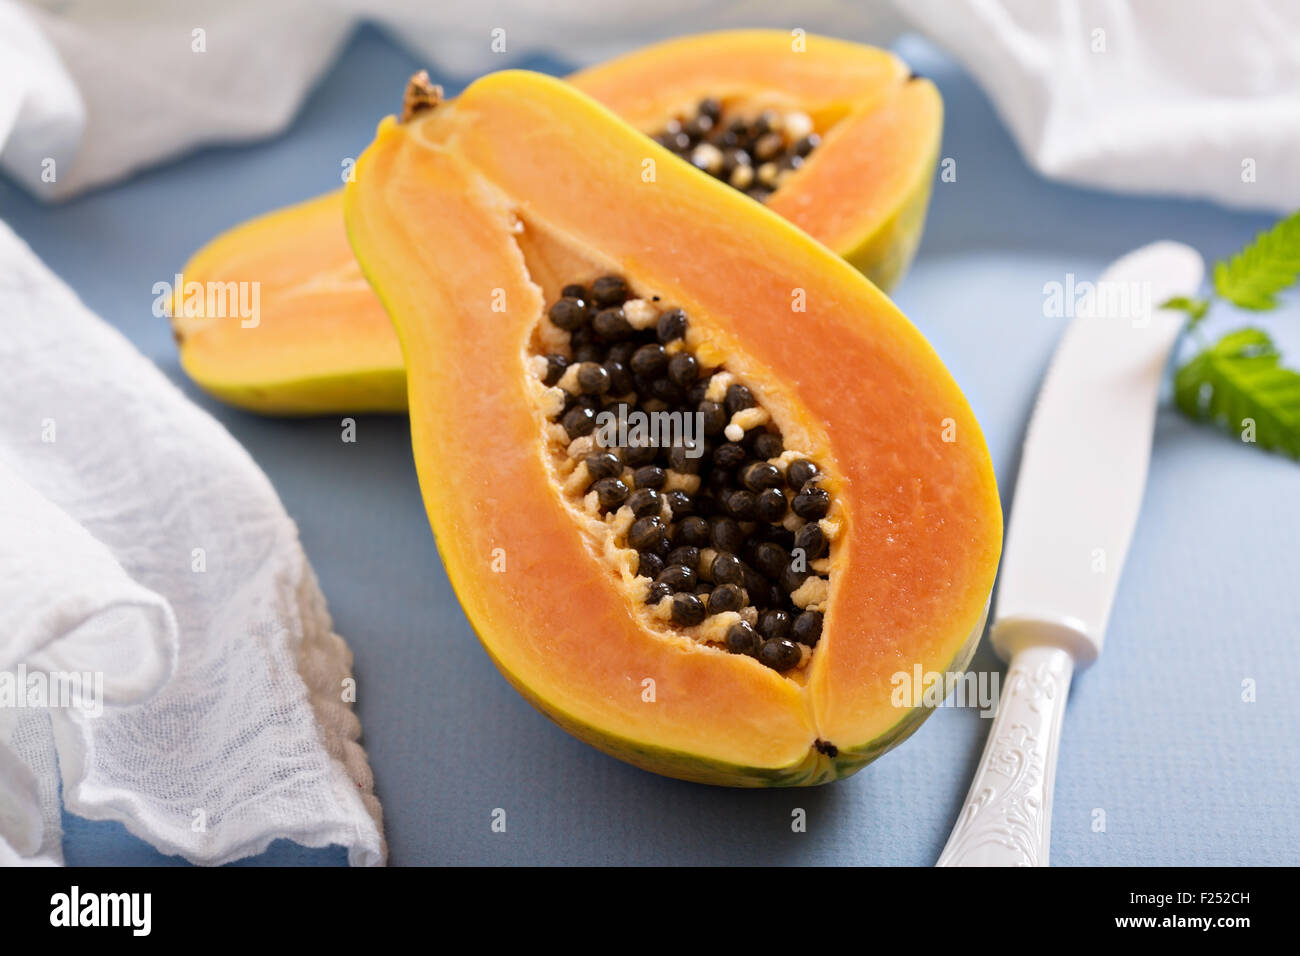 Cut papaya exotic fruit on a blue table - Stock Image